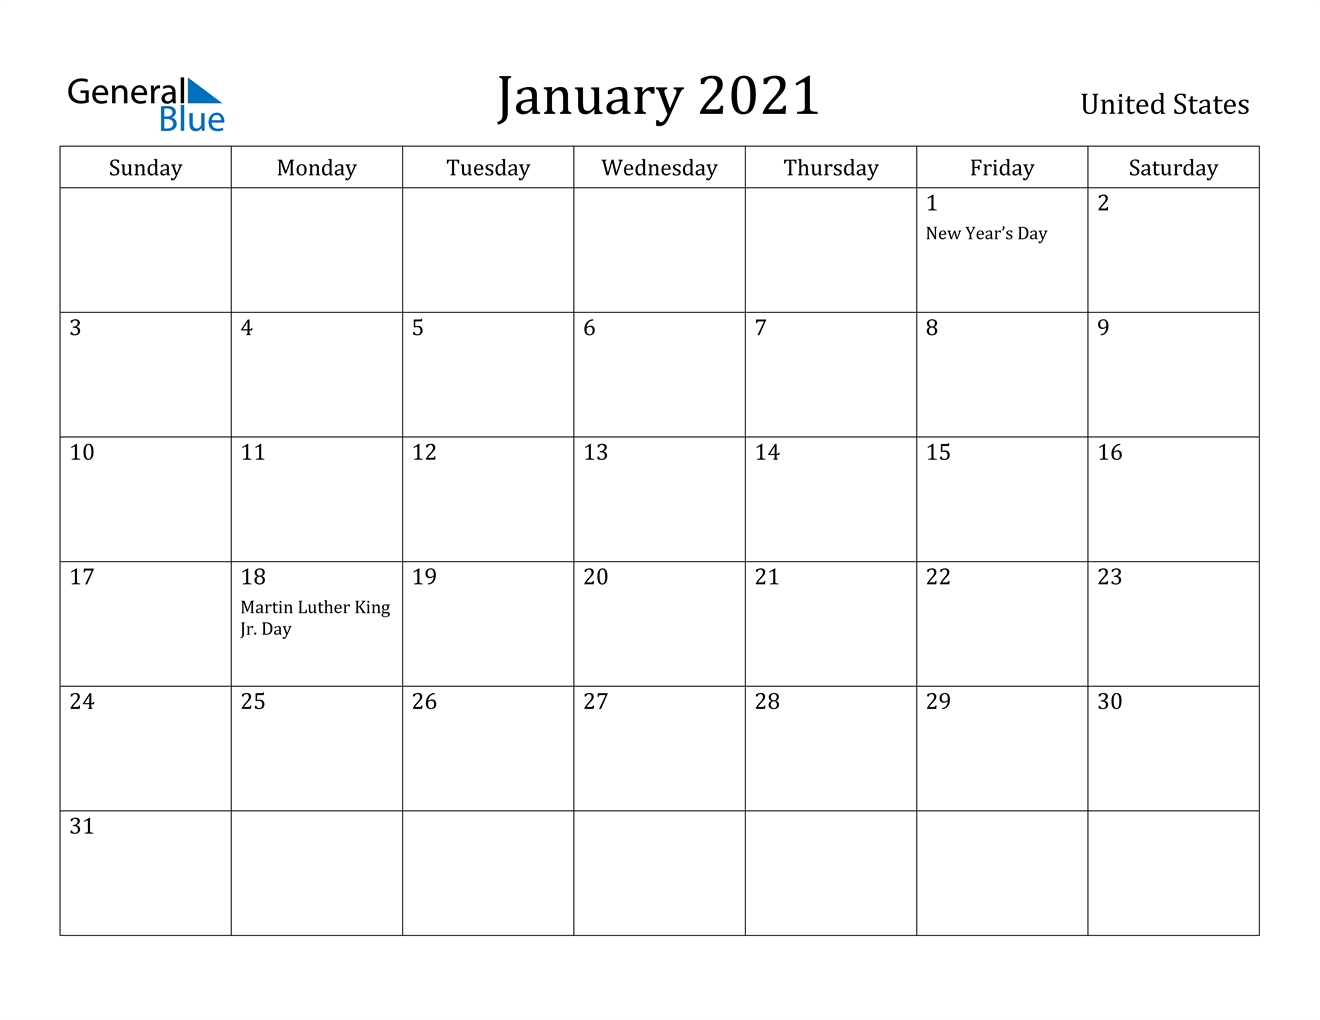 January 2021 Calendar - United States